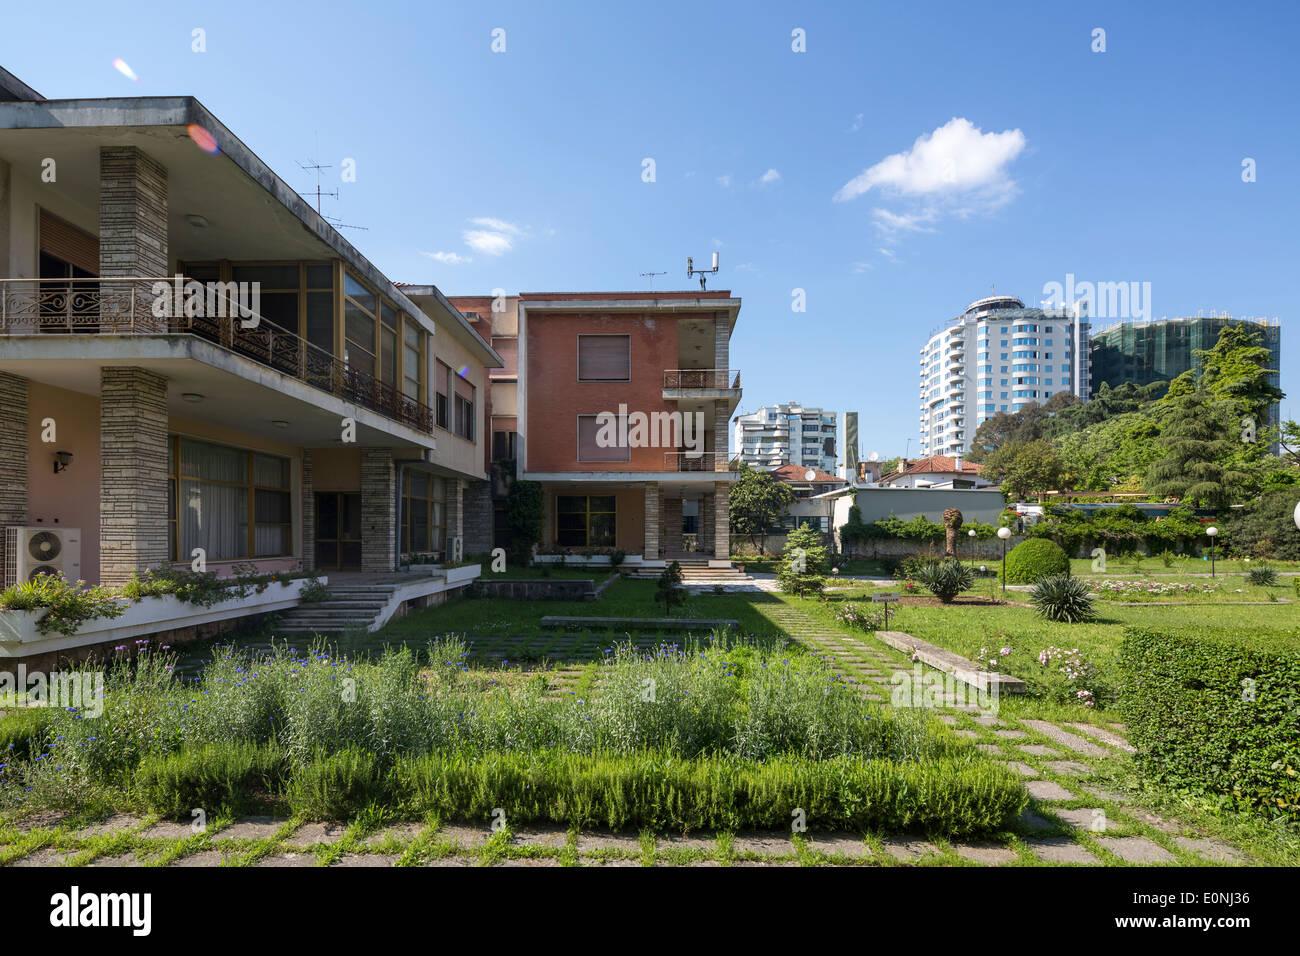 Former Residence of Enver Hoxha, Blloku District, Tirana, Albania - Stock Image